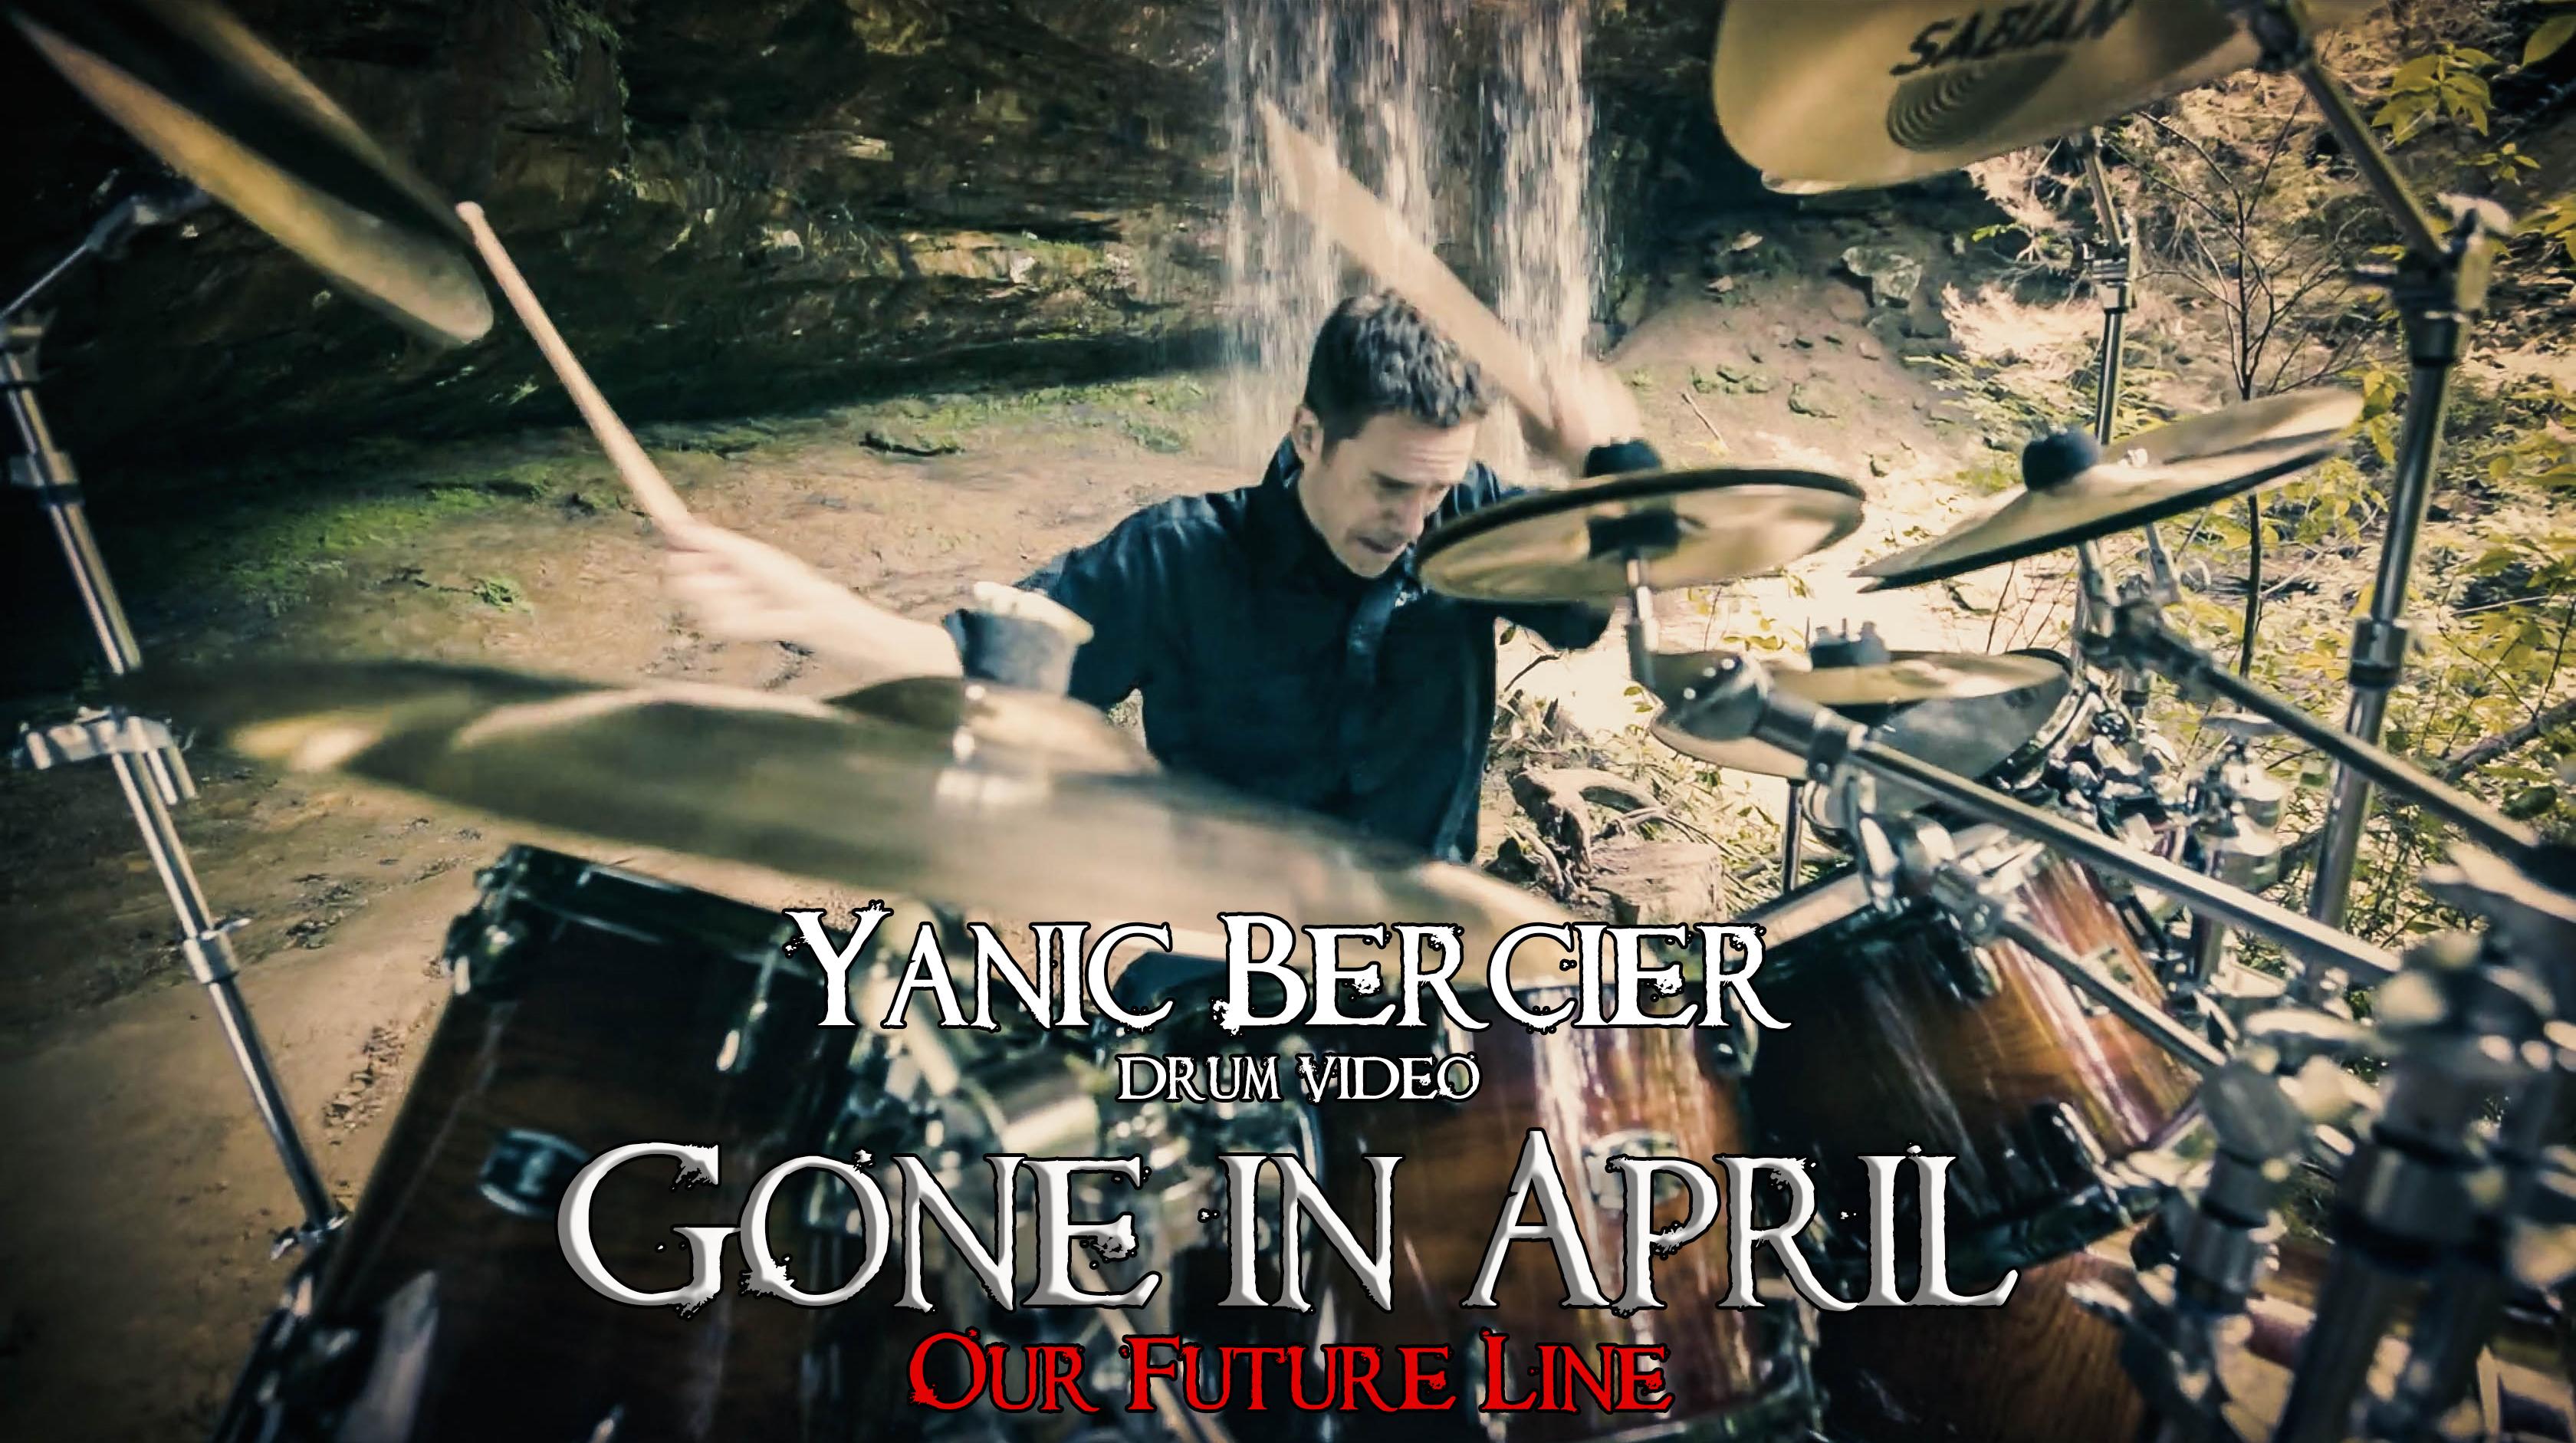 Gone in April Yanic Bercier drum playthrough